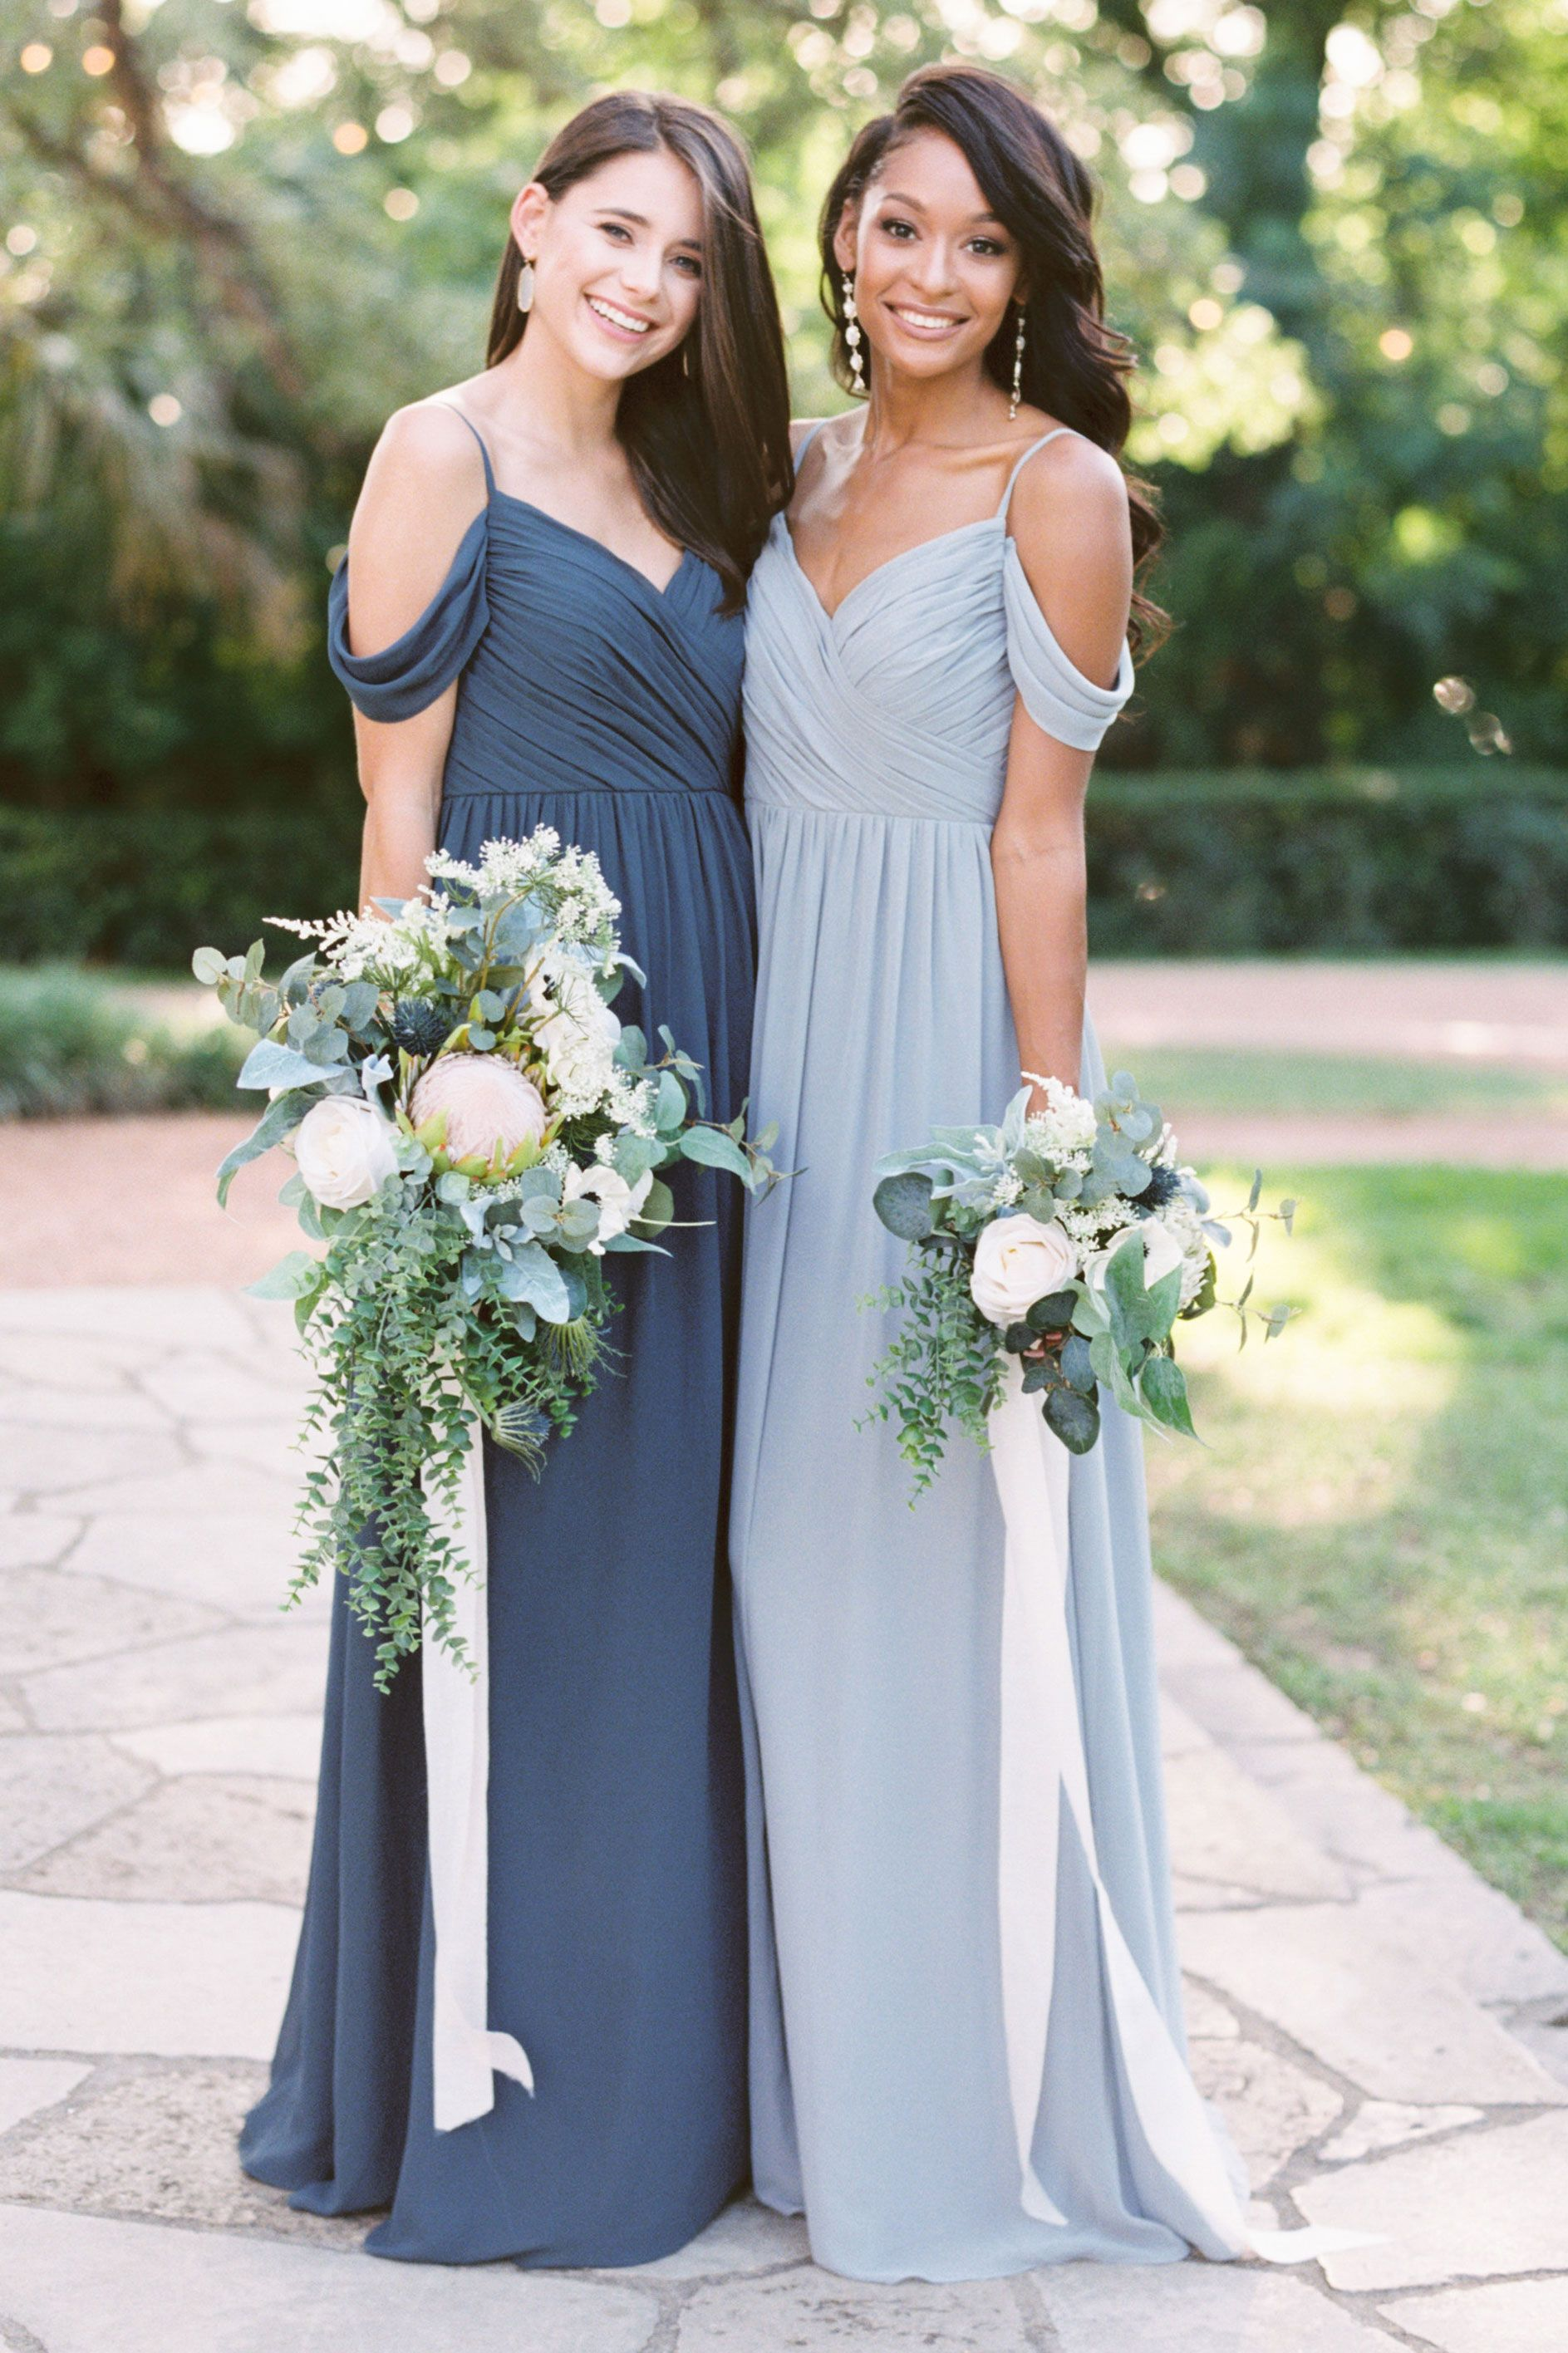 Lily Chiffon Dress Wedding Bridesmaid Dresses Blue Bridesmaid